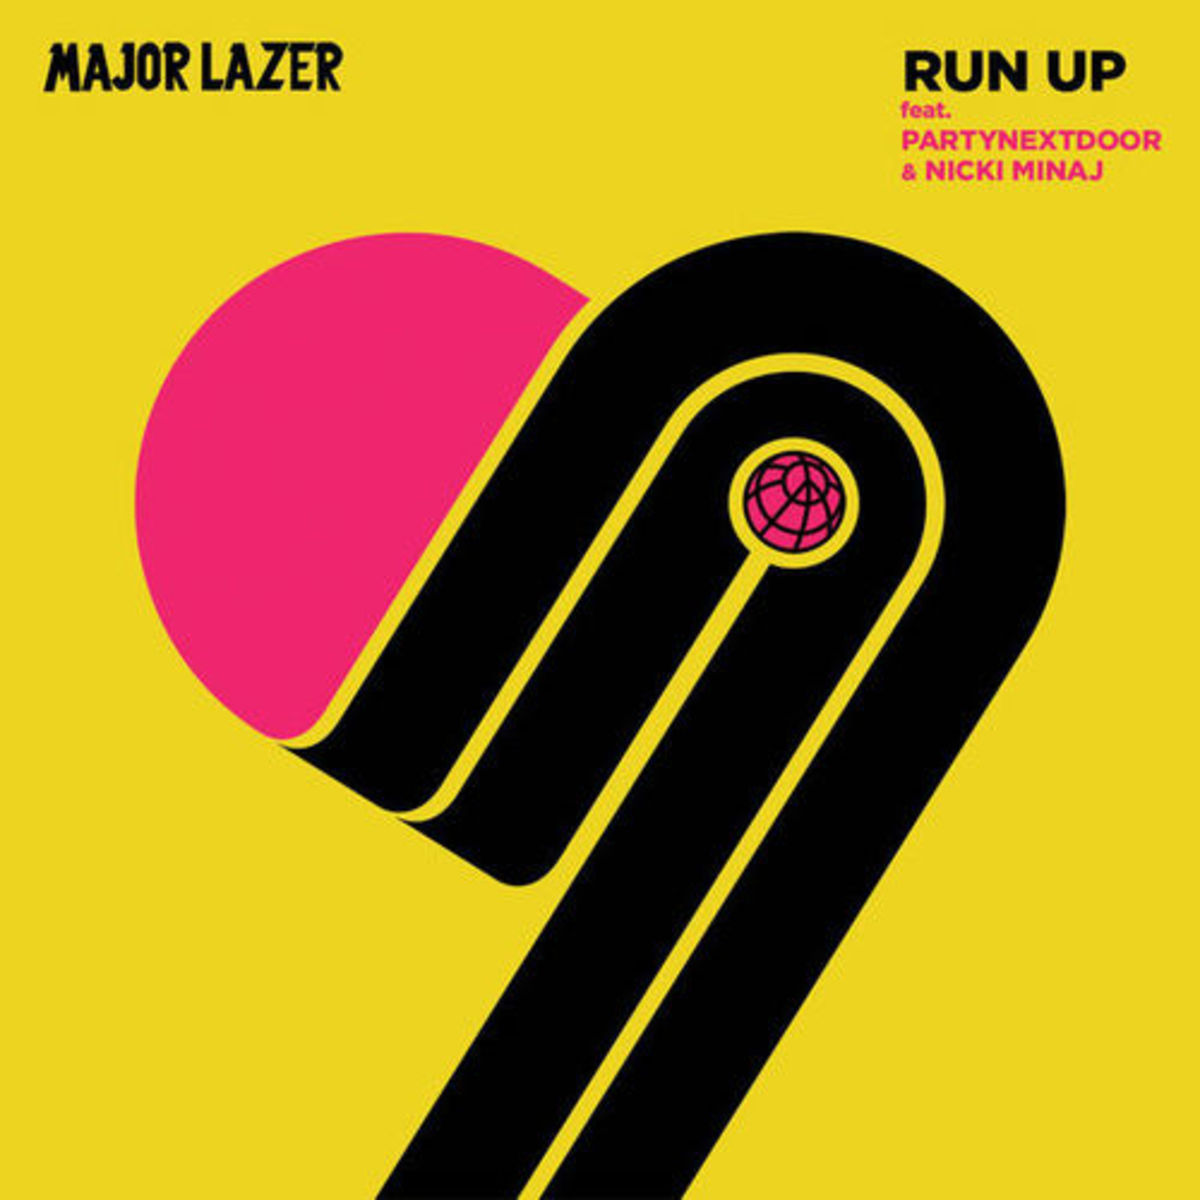 major-lazer-run-up.jpg